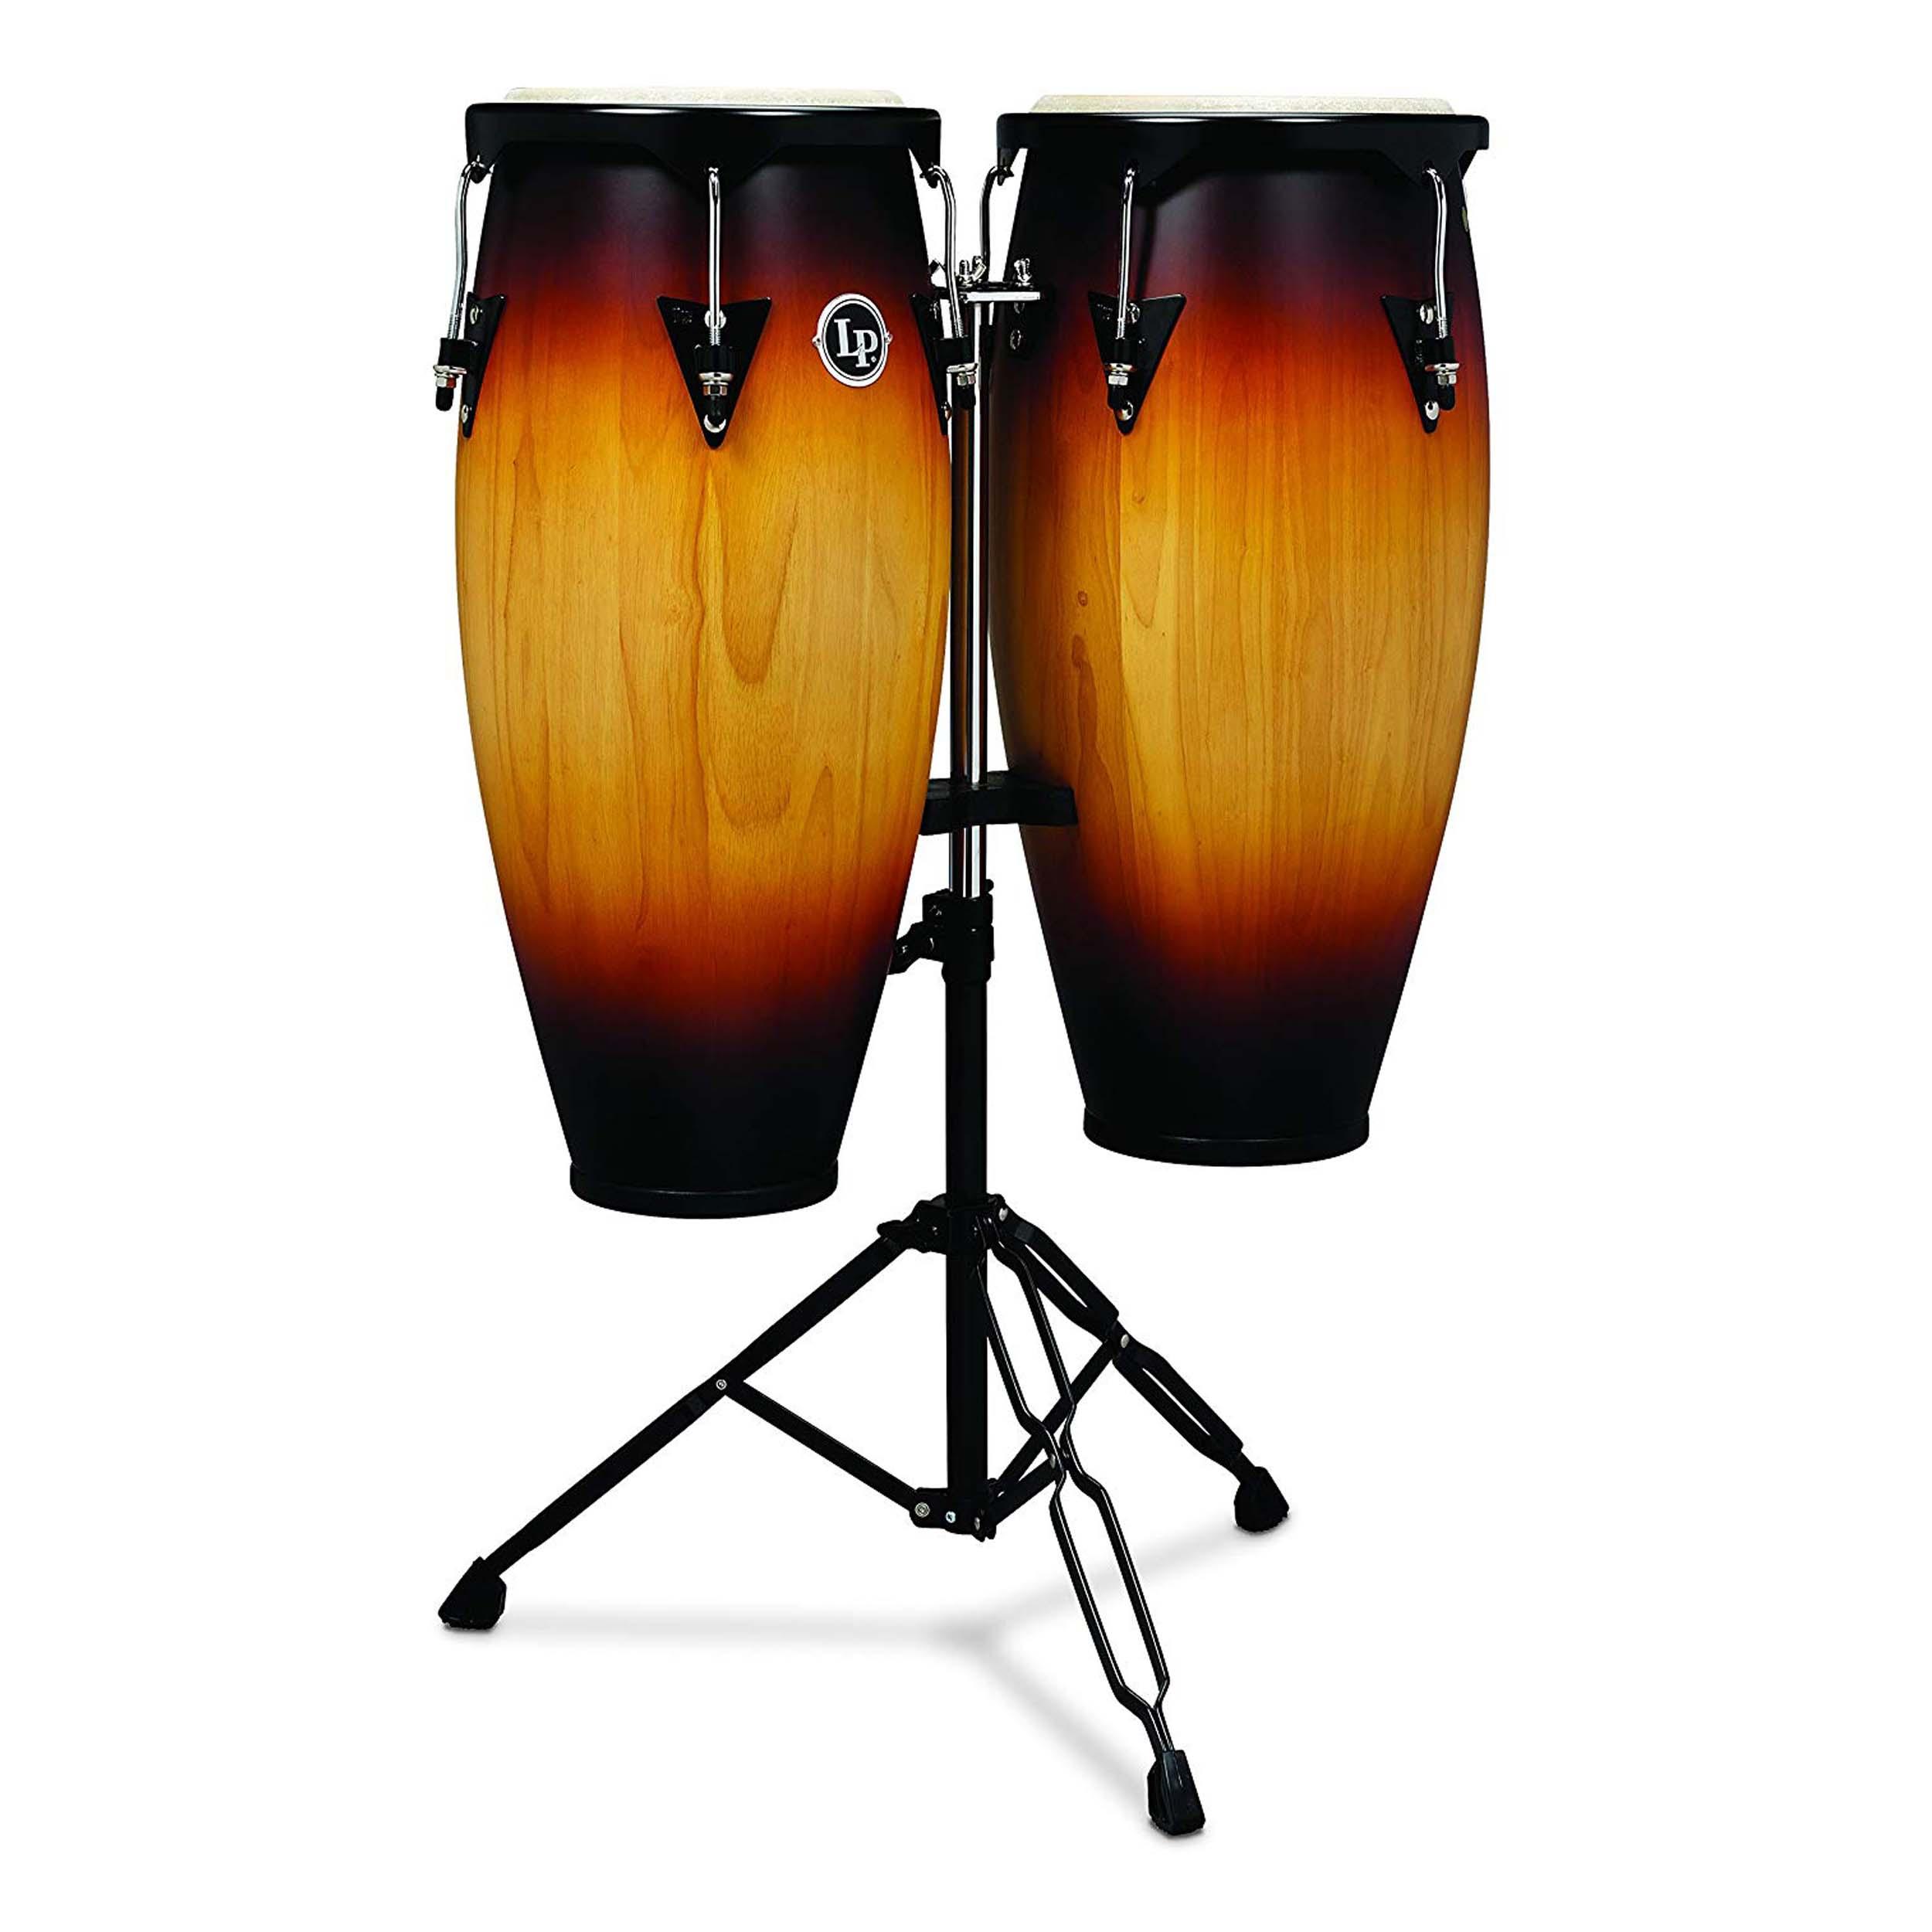 latin percussion lp city wood congas 10 11 set vintage sunburst ebay. Black Bedroom Furniture Sets. Home Design Ideas